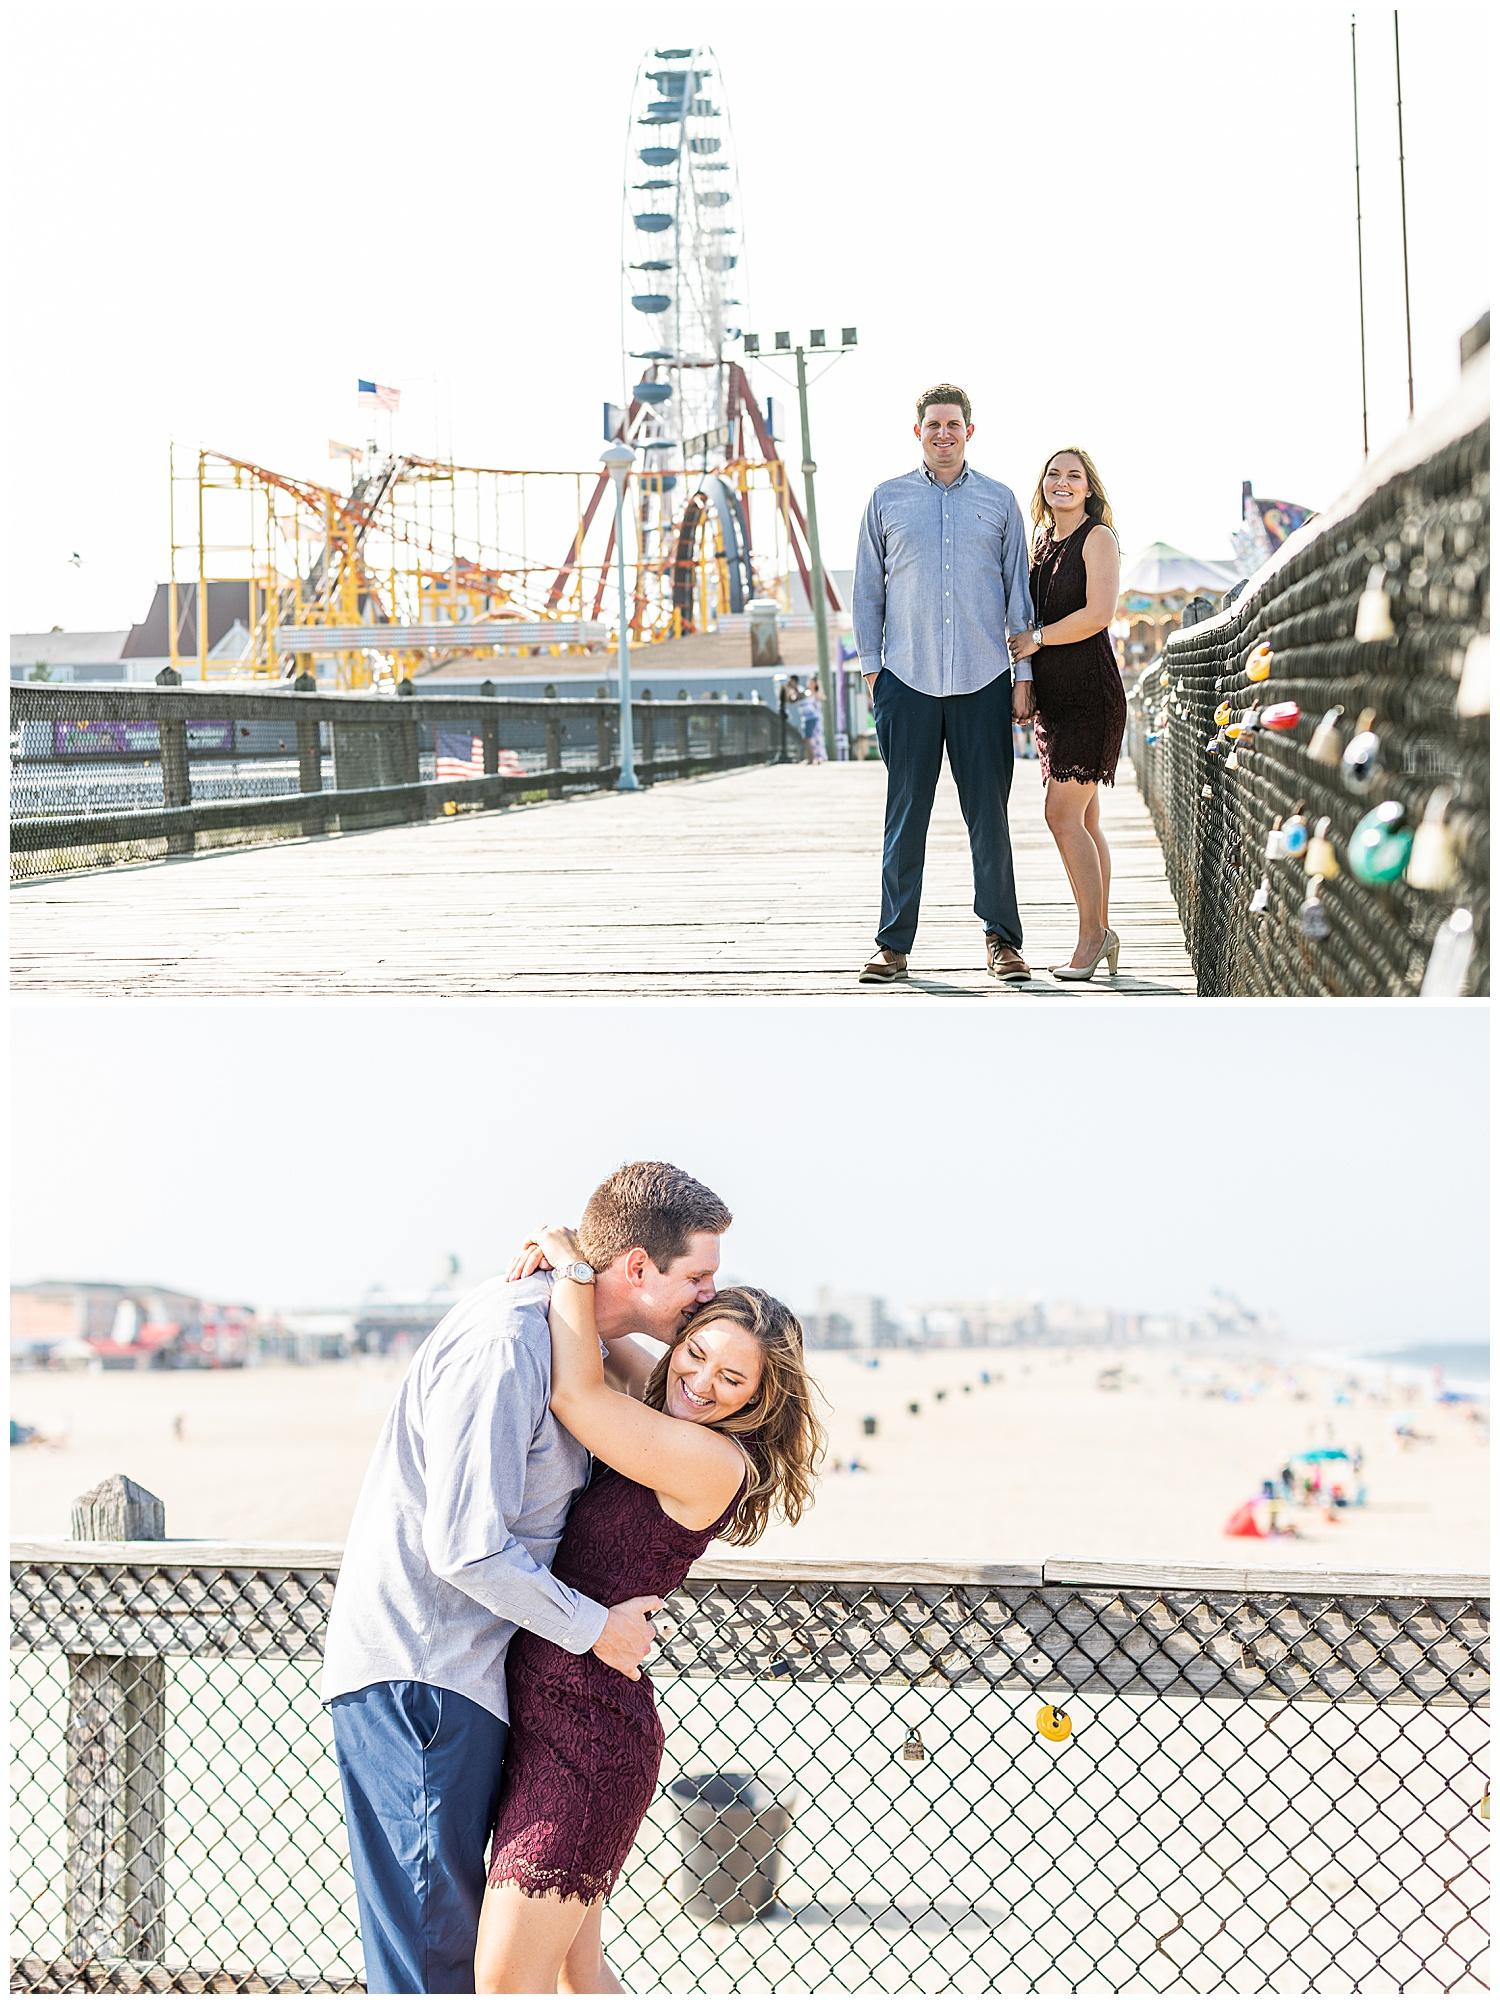 Lindsay + Matt Ocean City Engagement Session Living Radiant Photography photos_0018.jpg